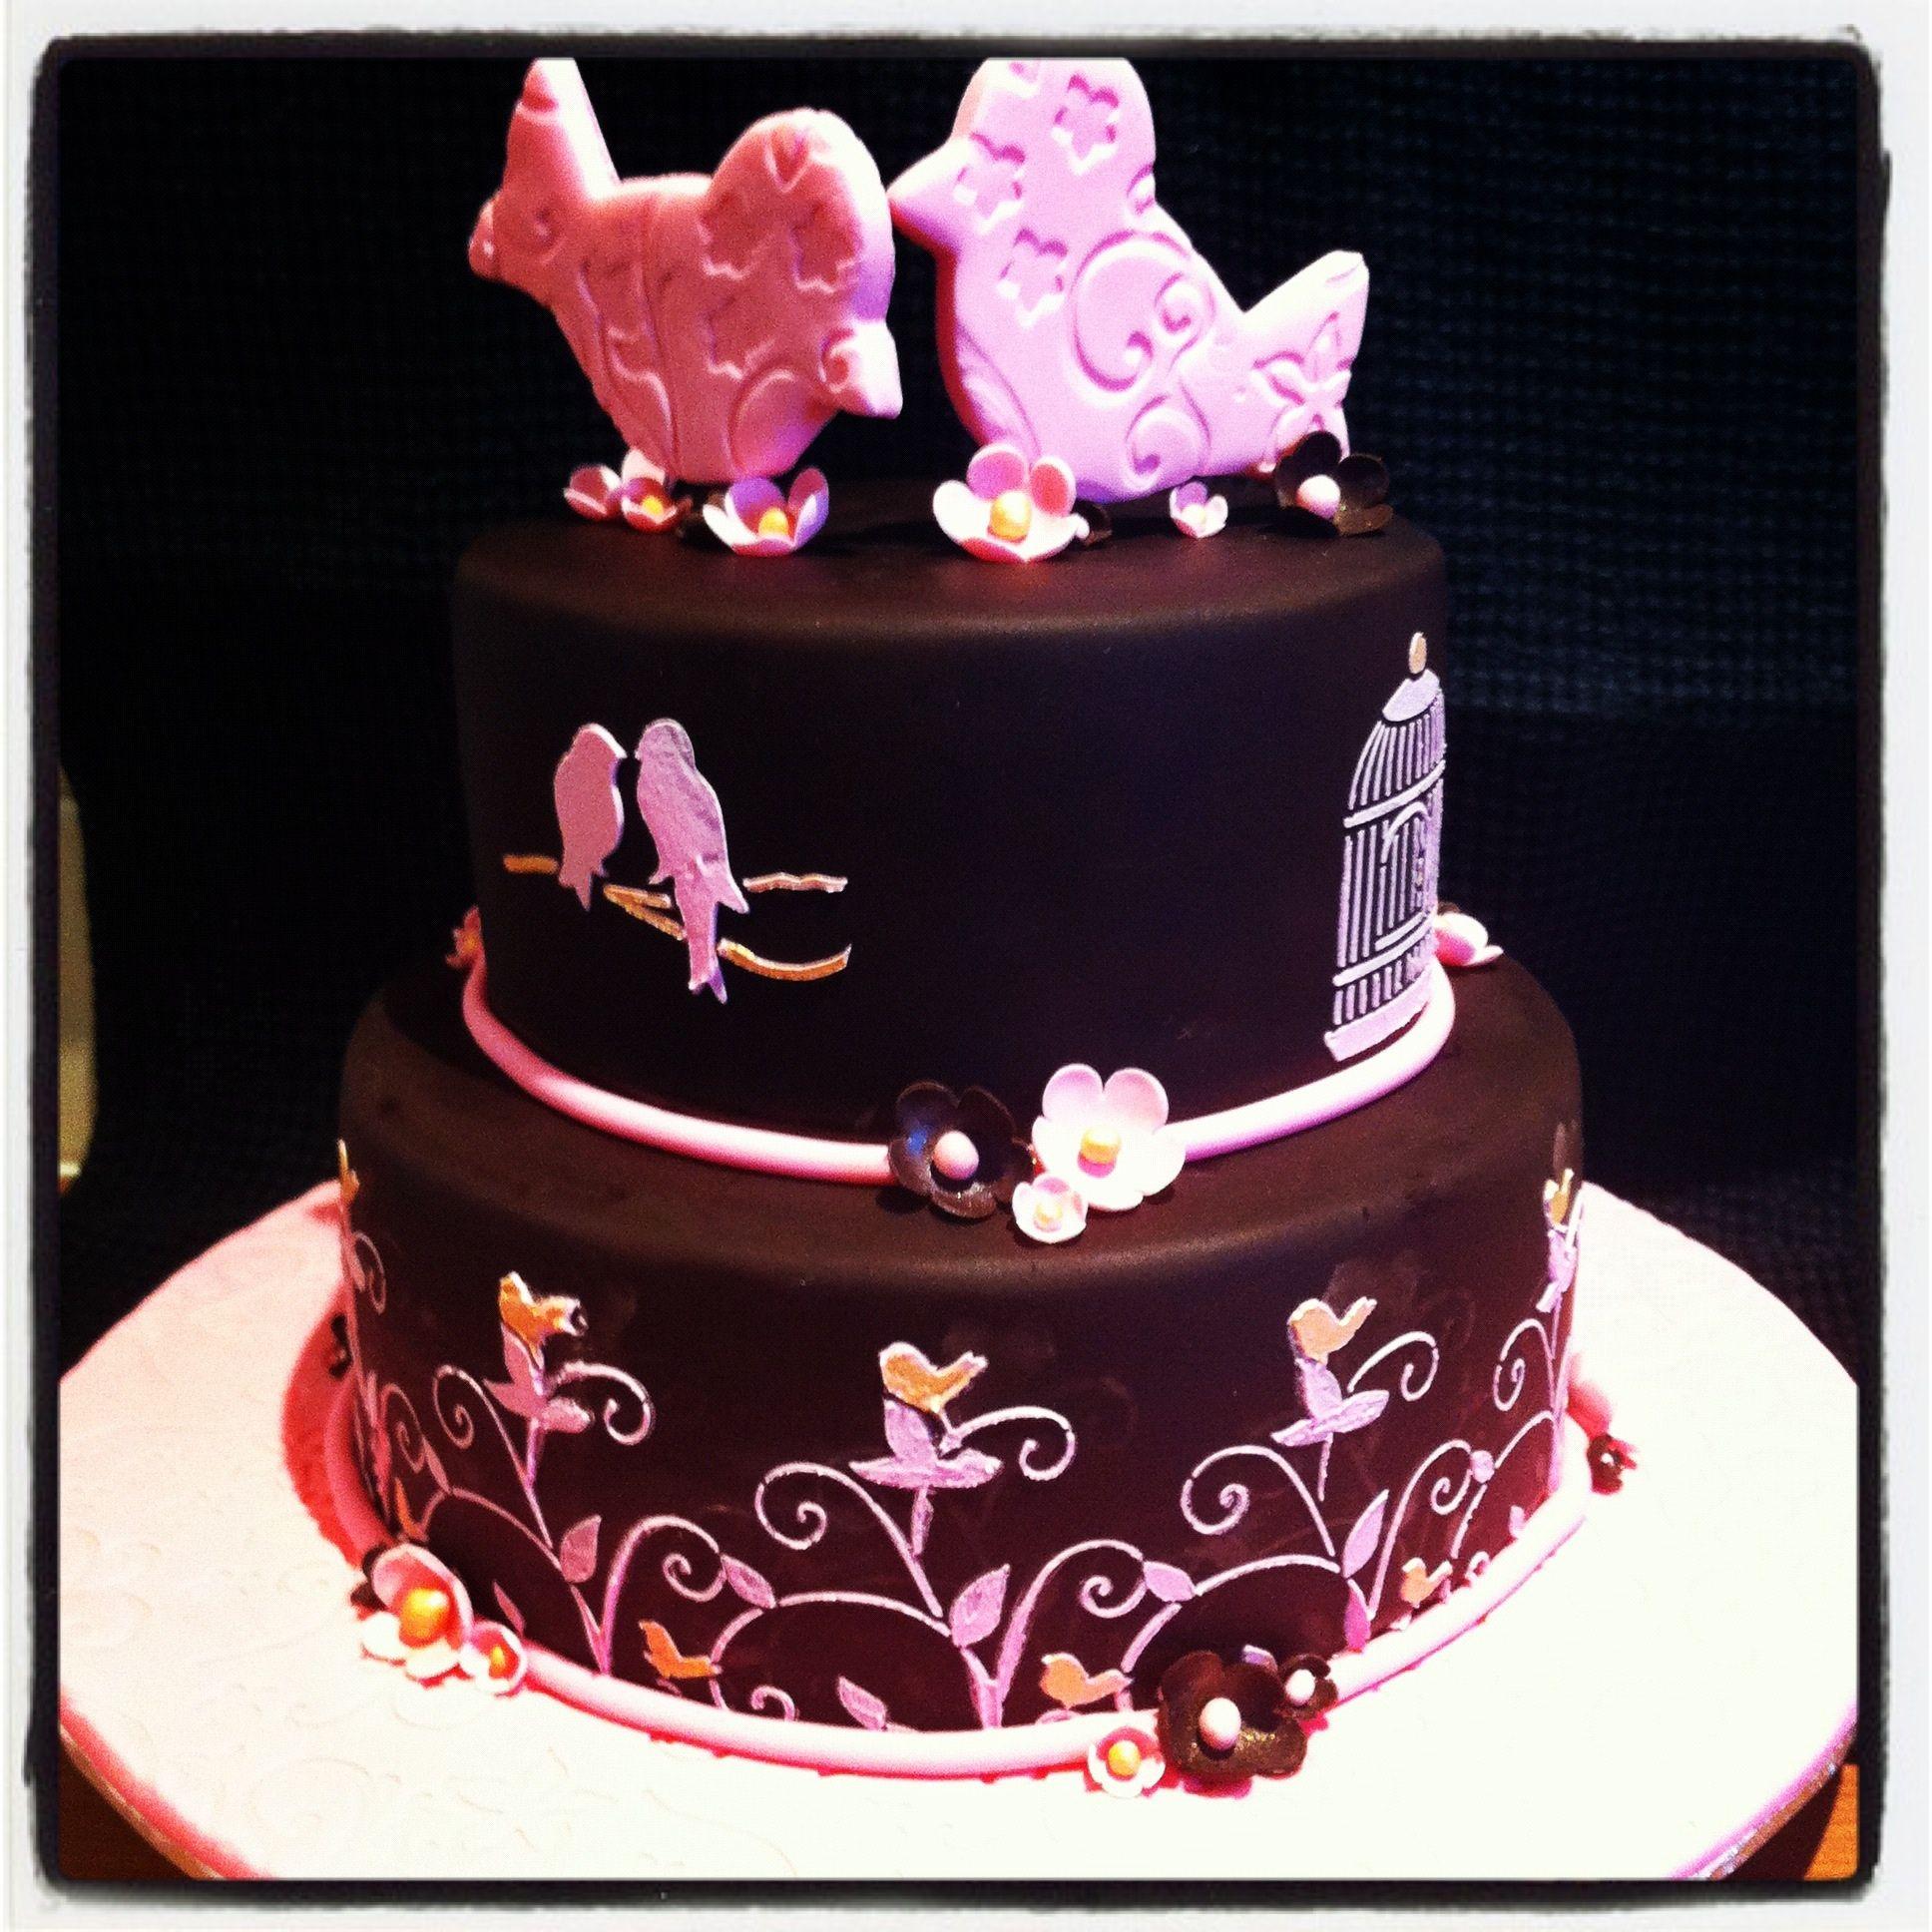 My daughters 10th birthday Chocolate mud cake with chocolate fondant